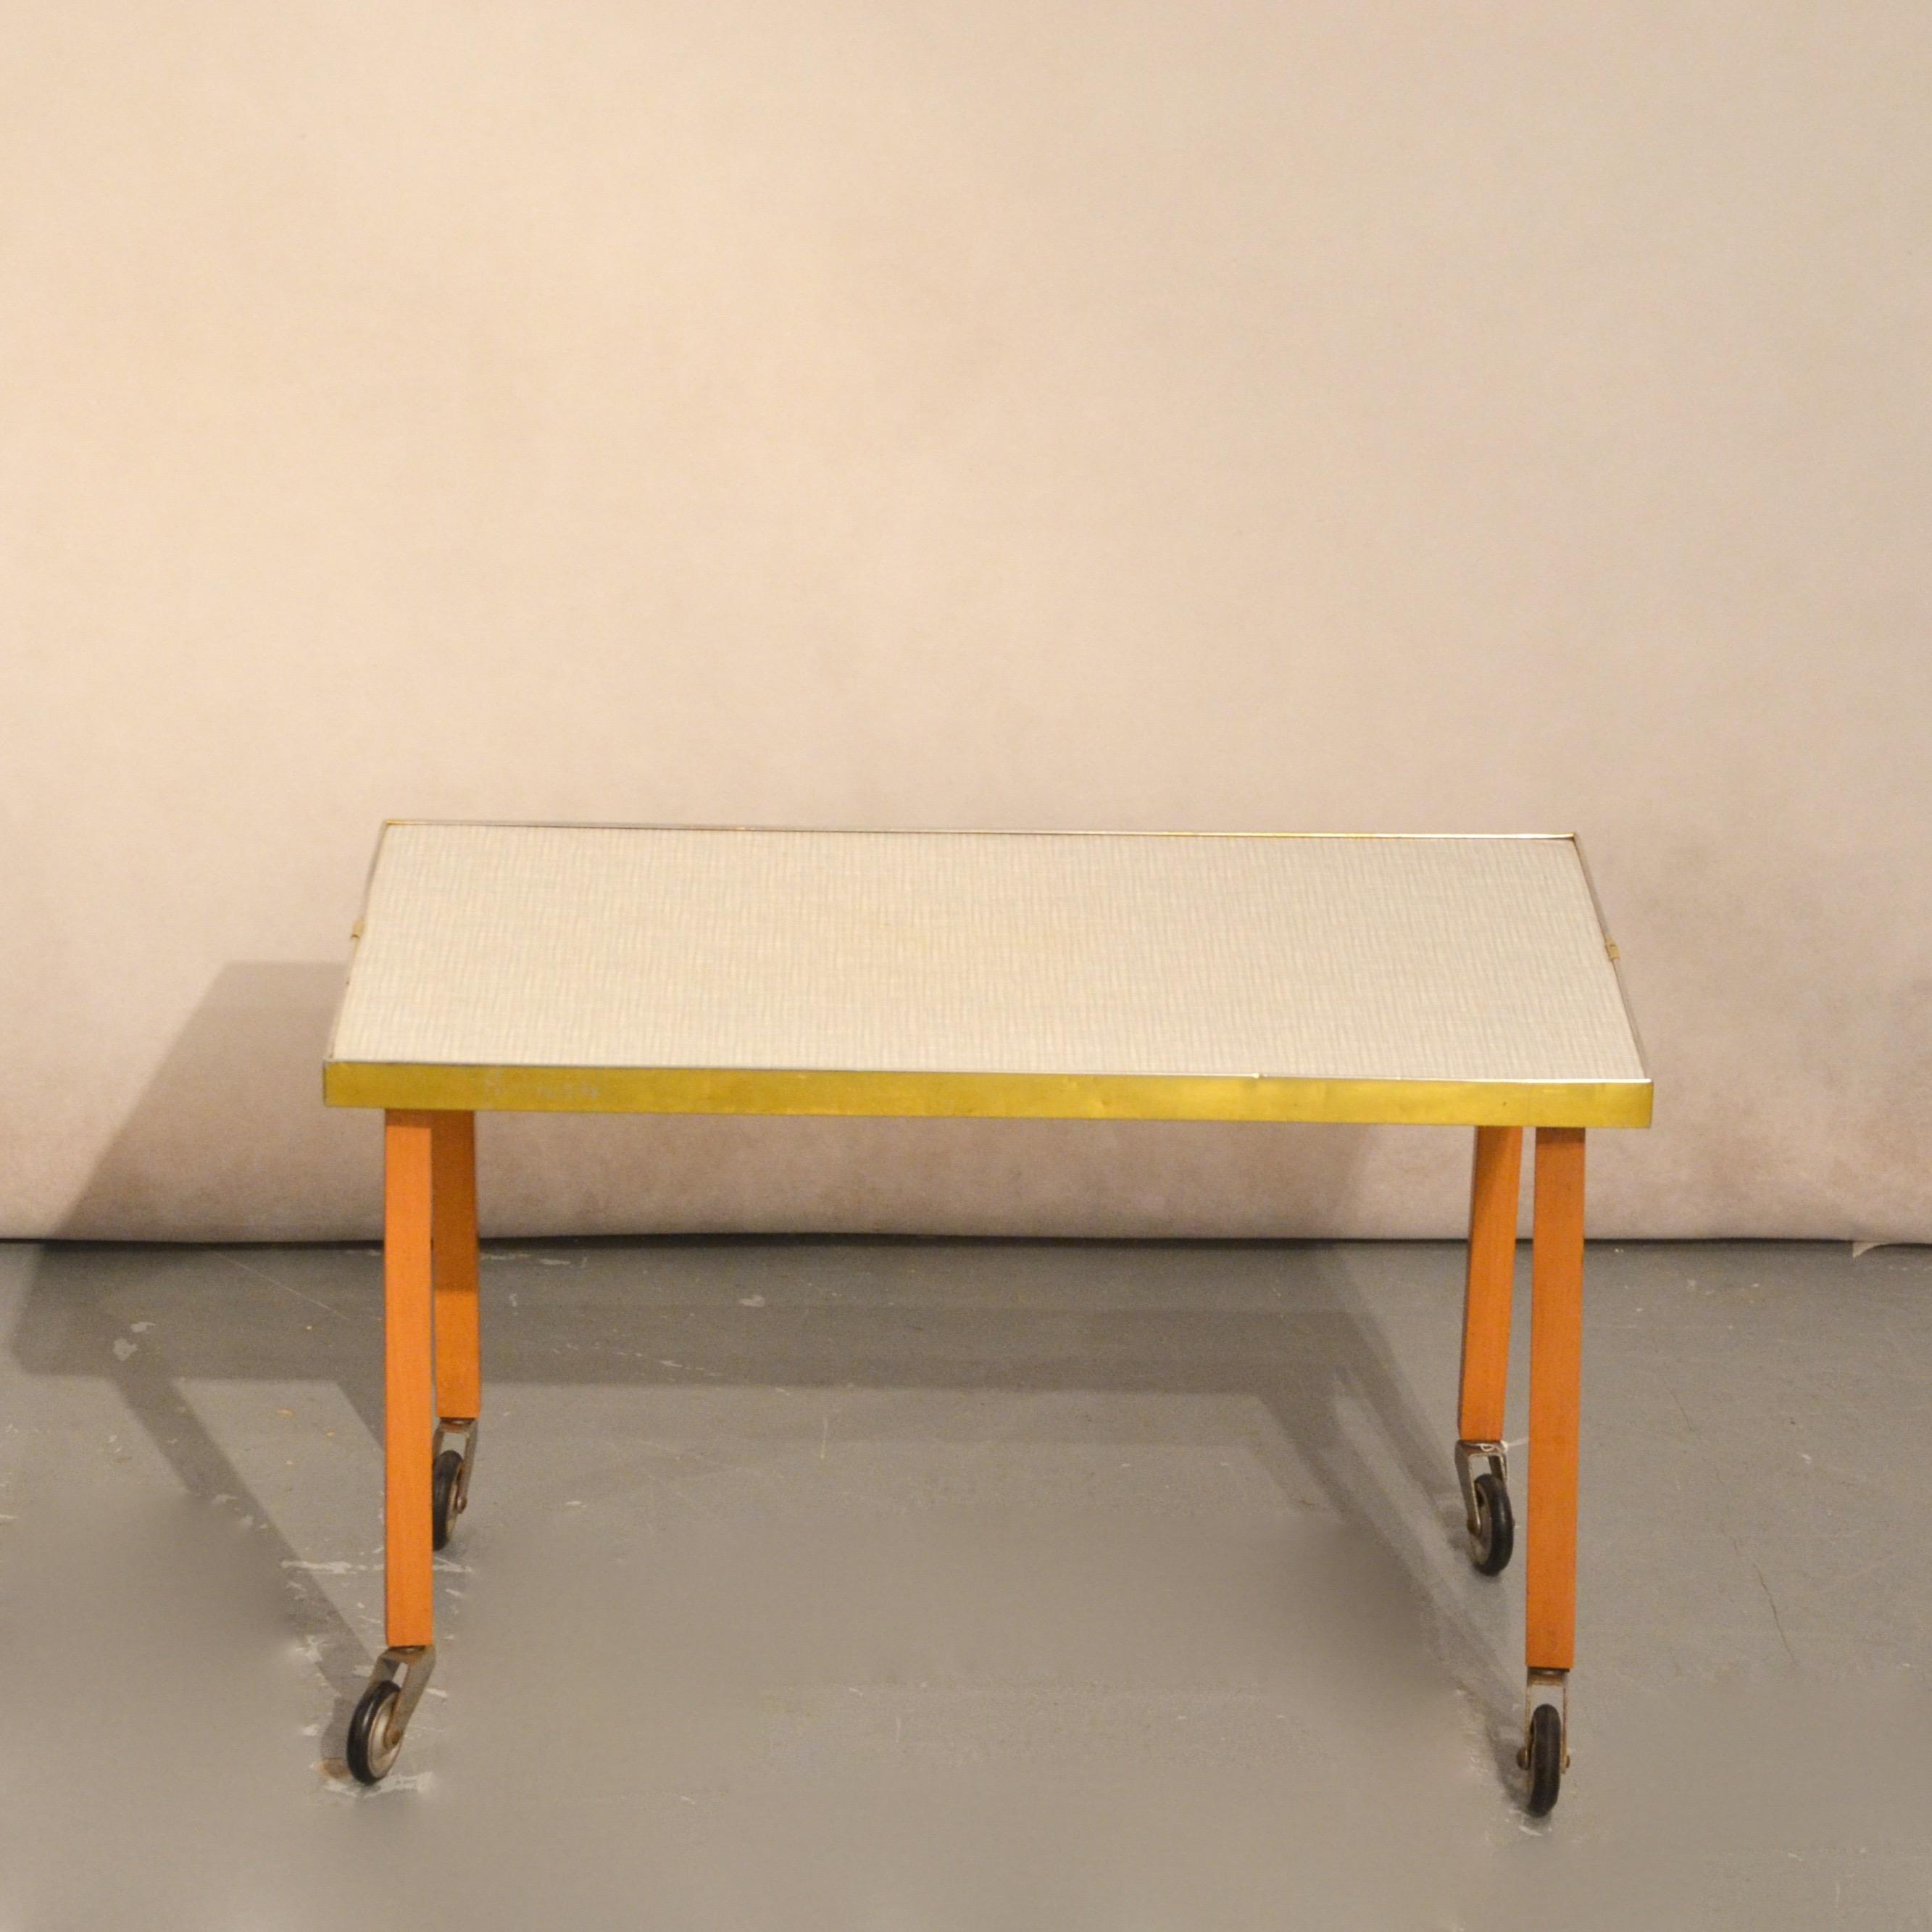 g nial petite table rectangulaire table de cuisine id es. Black Bedroom Furniture Sets. Home Design Ideas